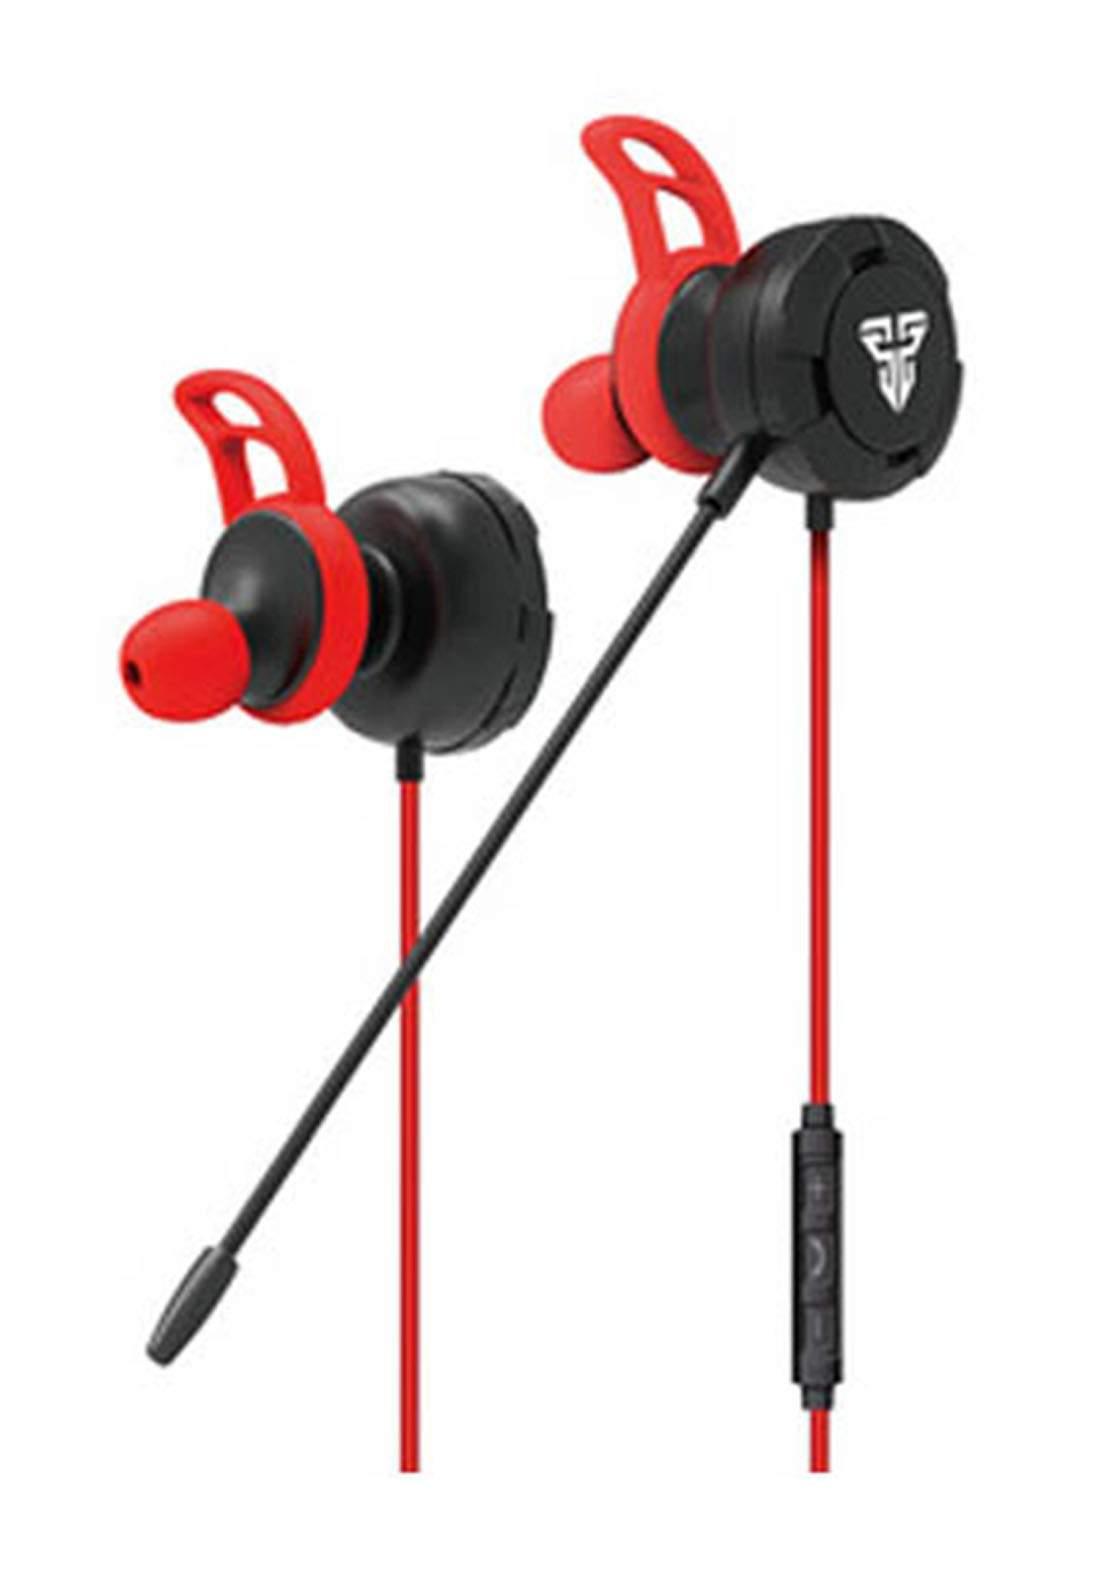 Fantech Eg1 In-Ear Gaming Earphones - Red سماعة